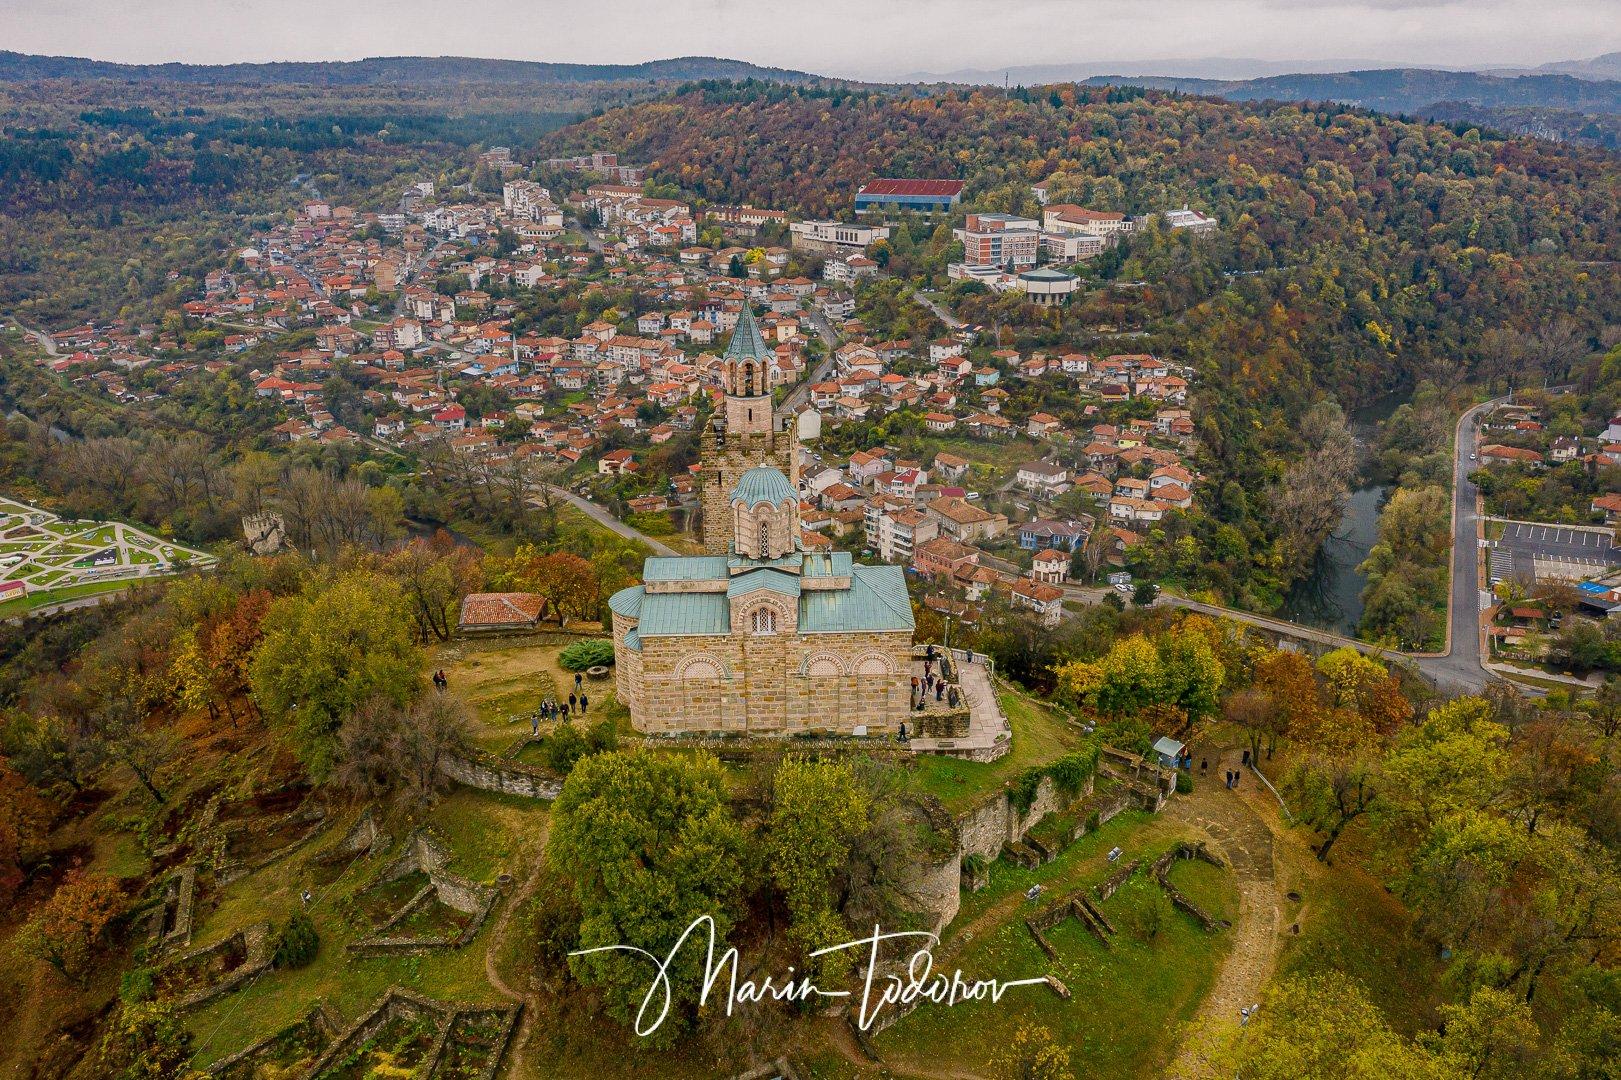 Tsarevets fortress in Veliko Tarnovo, Bulgaria - shot with DJI Mavic 2 Pro